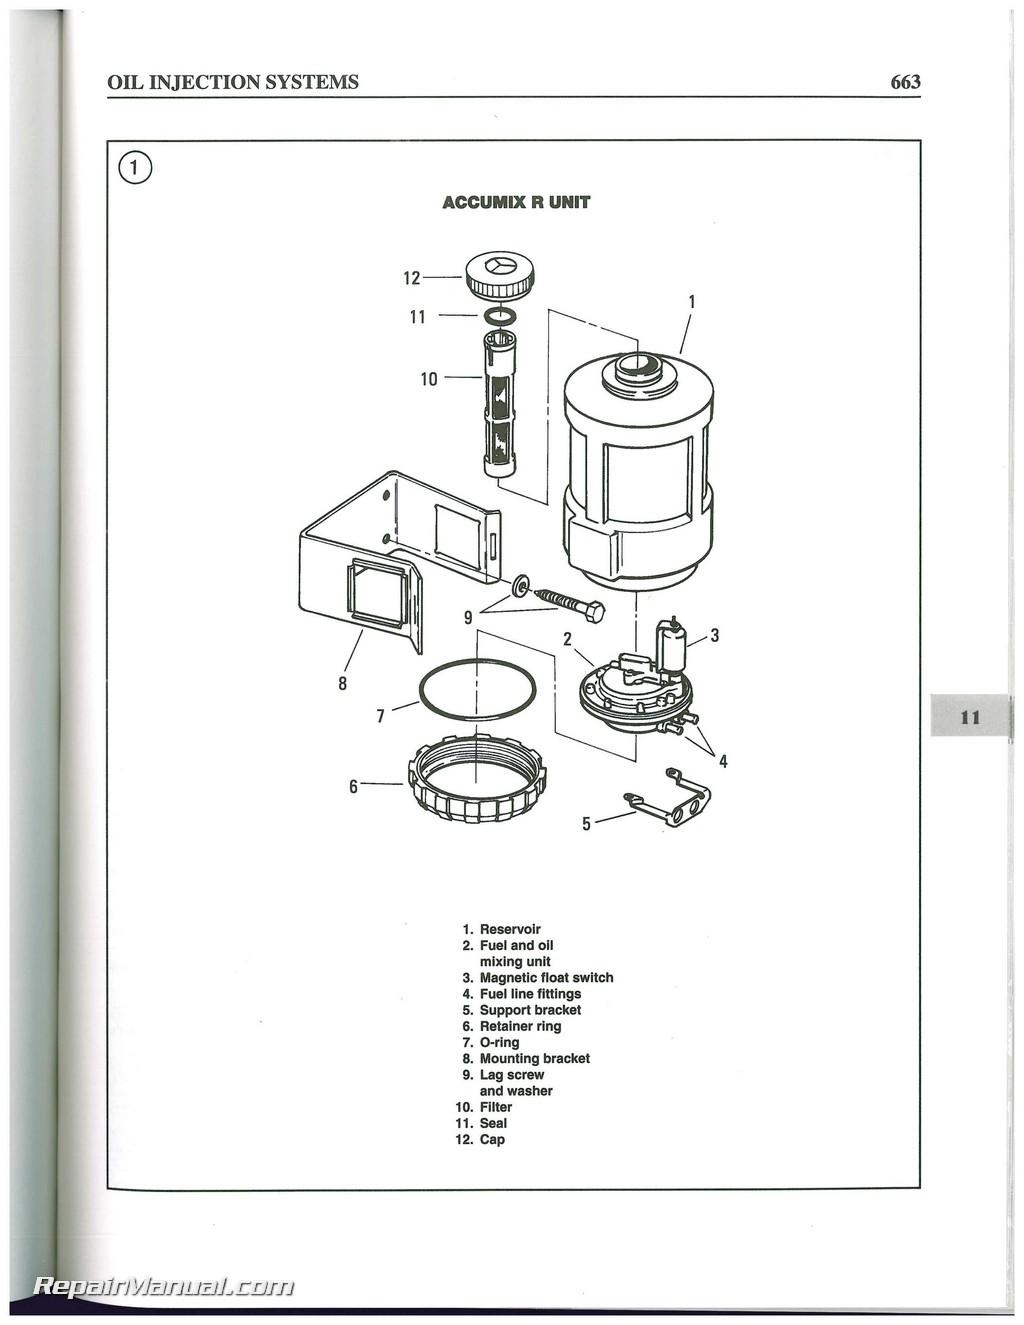 FX_8077] 1997 Evinrude Engine Diagram Wiring DiagramPhon Nekout Expe Nnigh Benkeme Mohammedshrine Librar Wiring 101